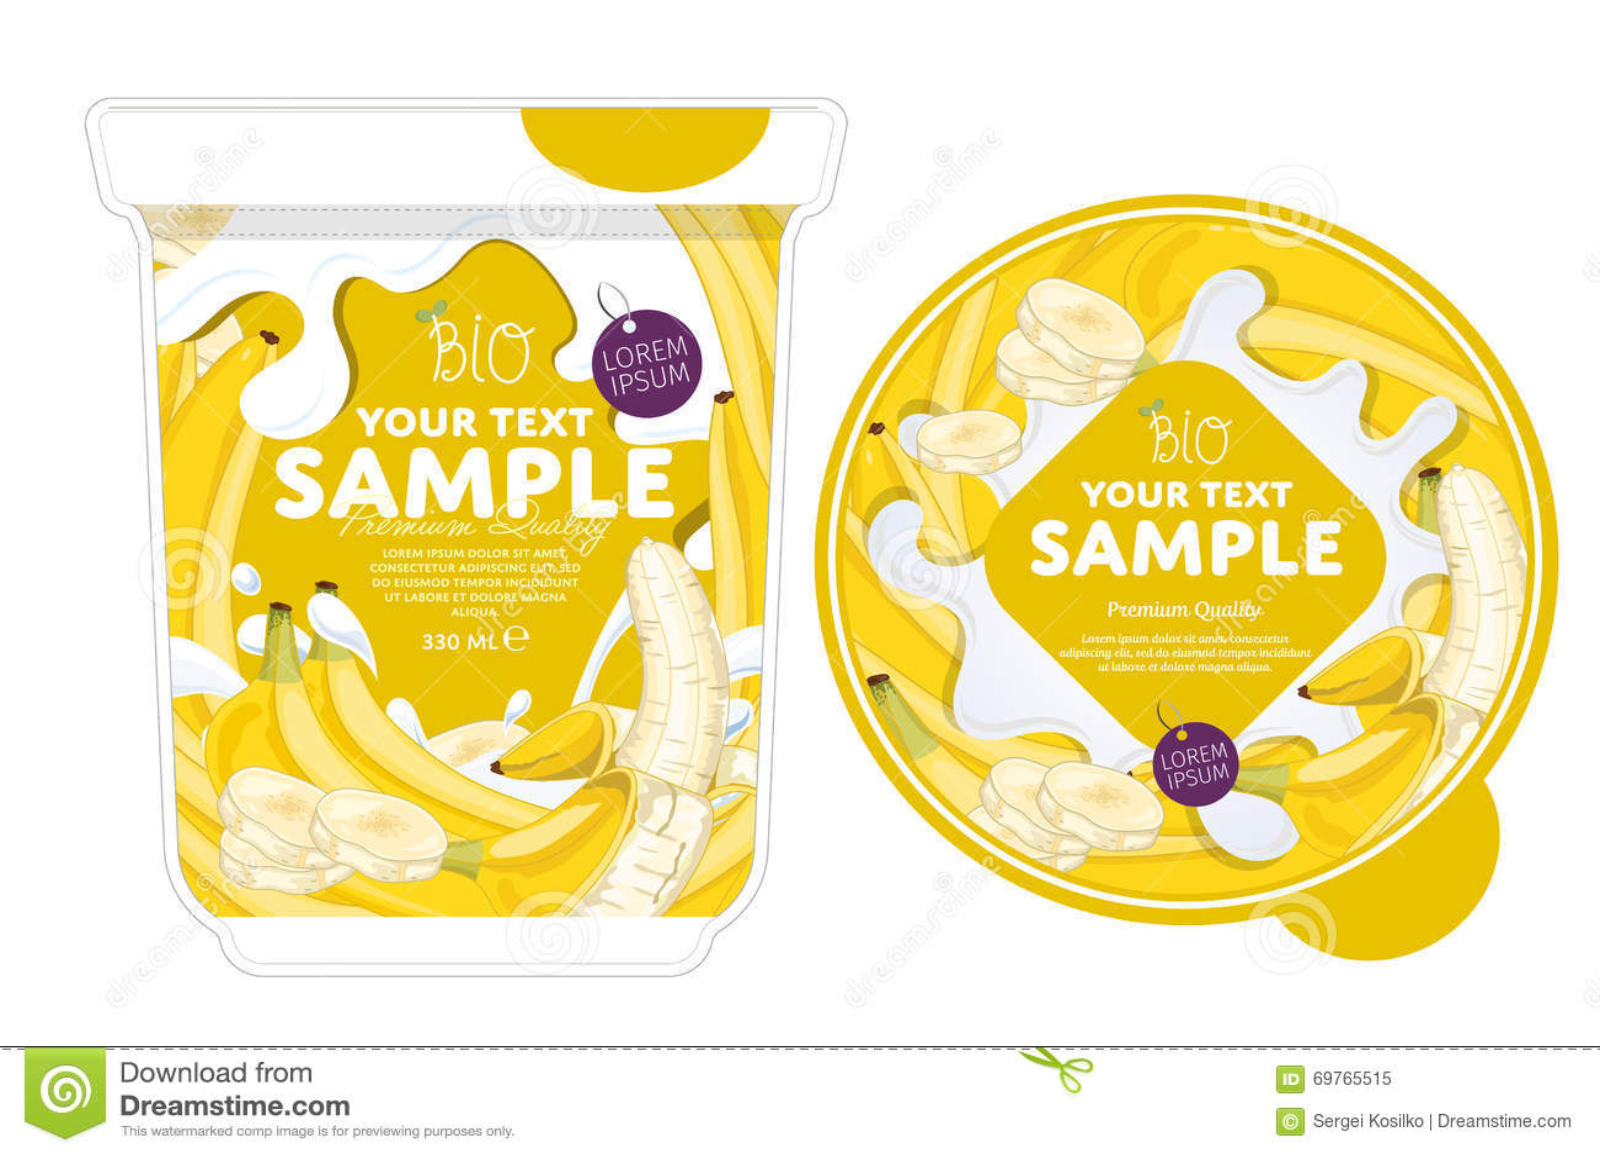 banana yogurt packaging design template stock illustration